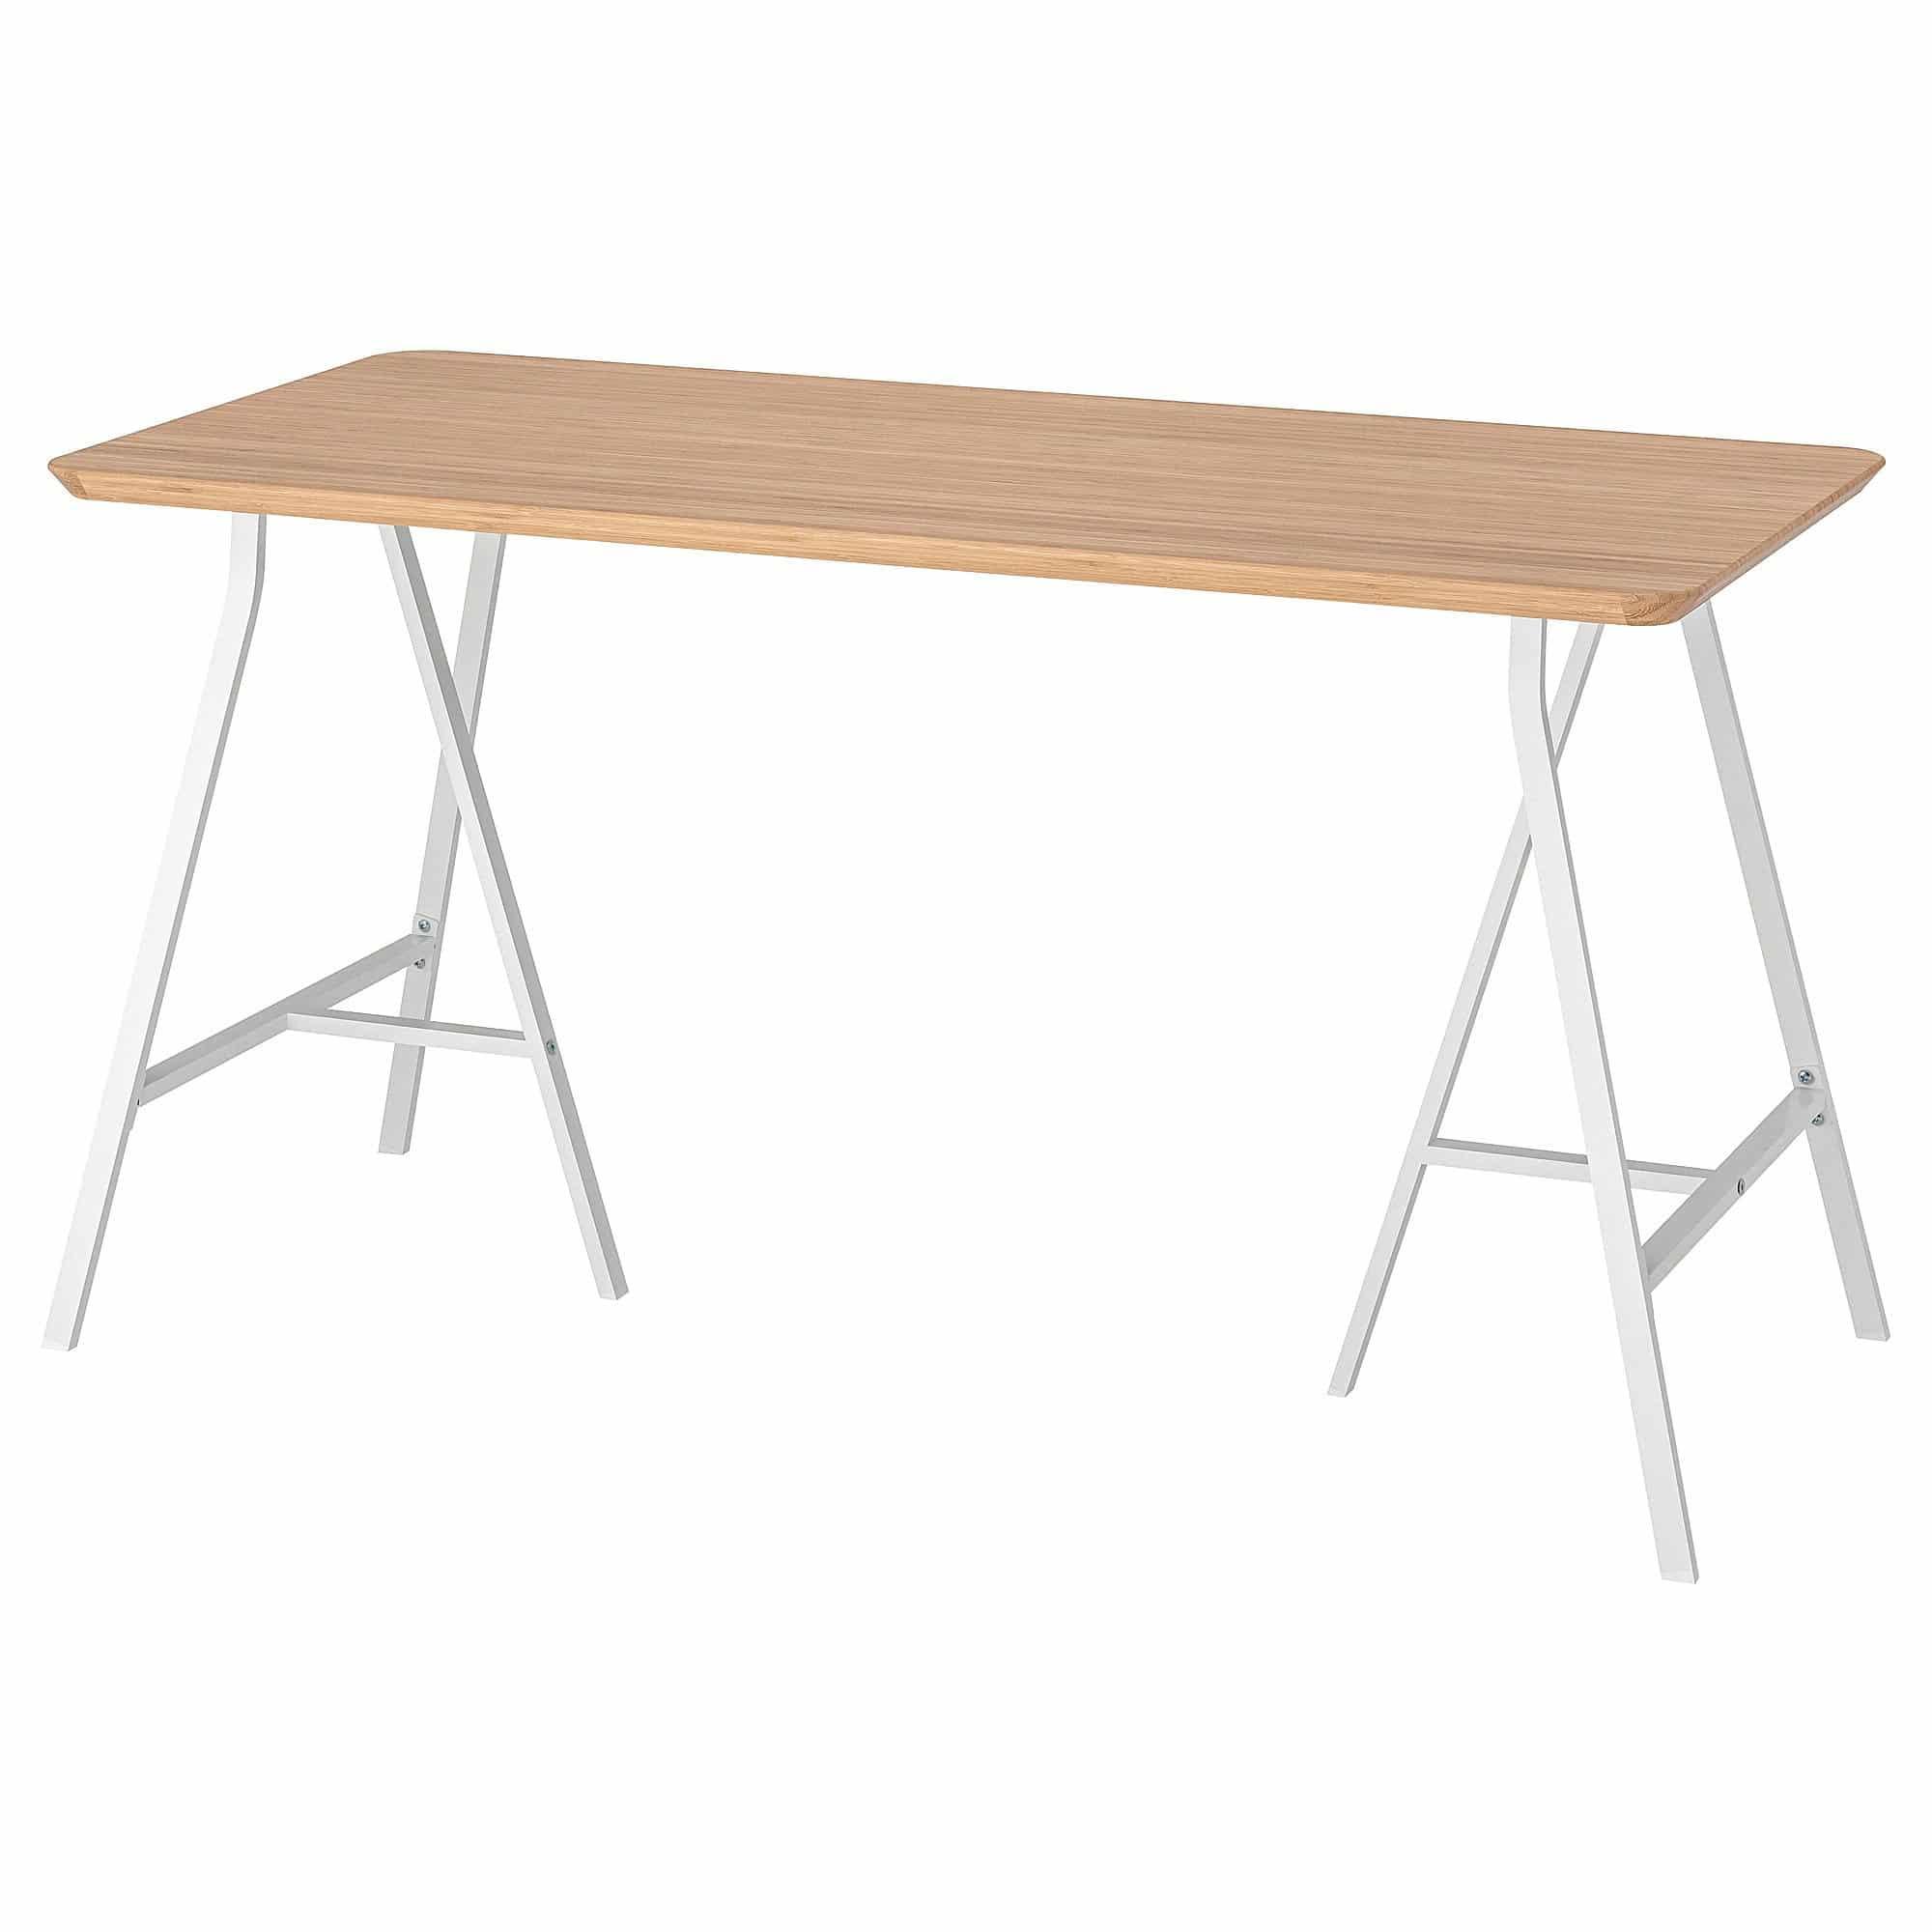 Hilver lerberg witte bamboe tafel van Ikea